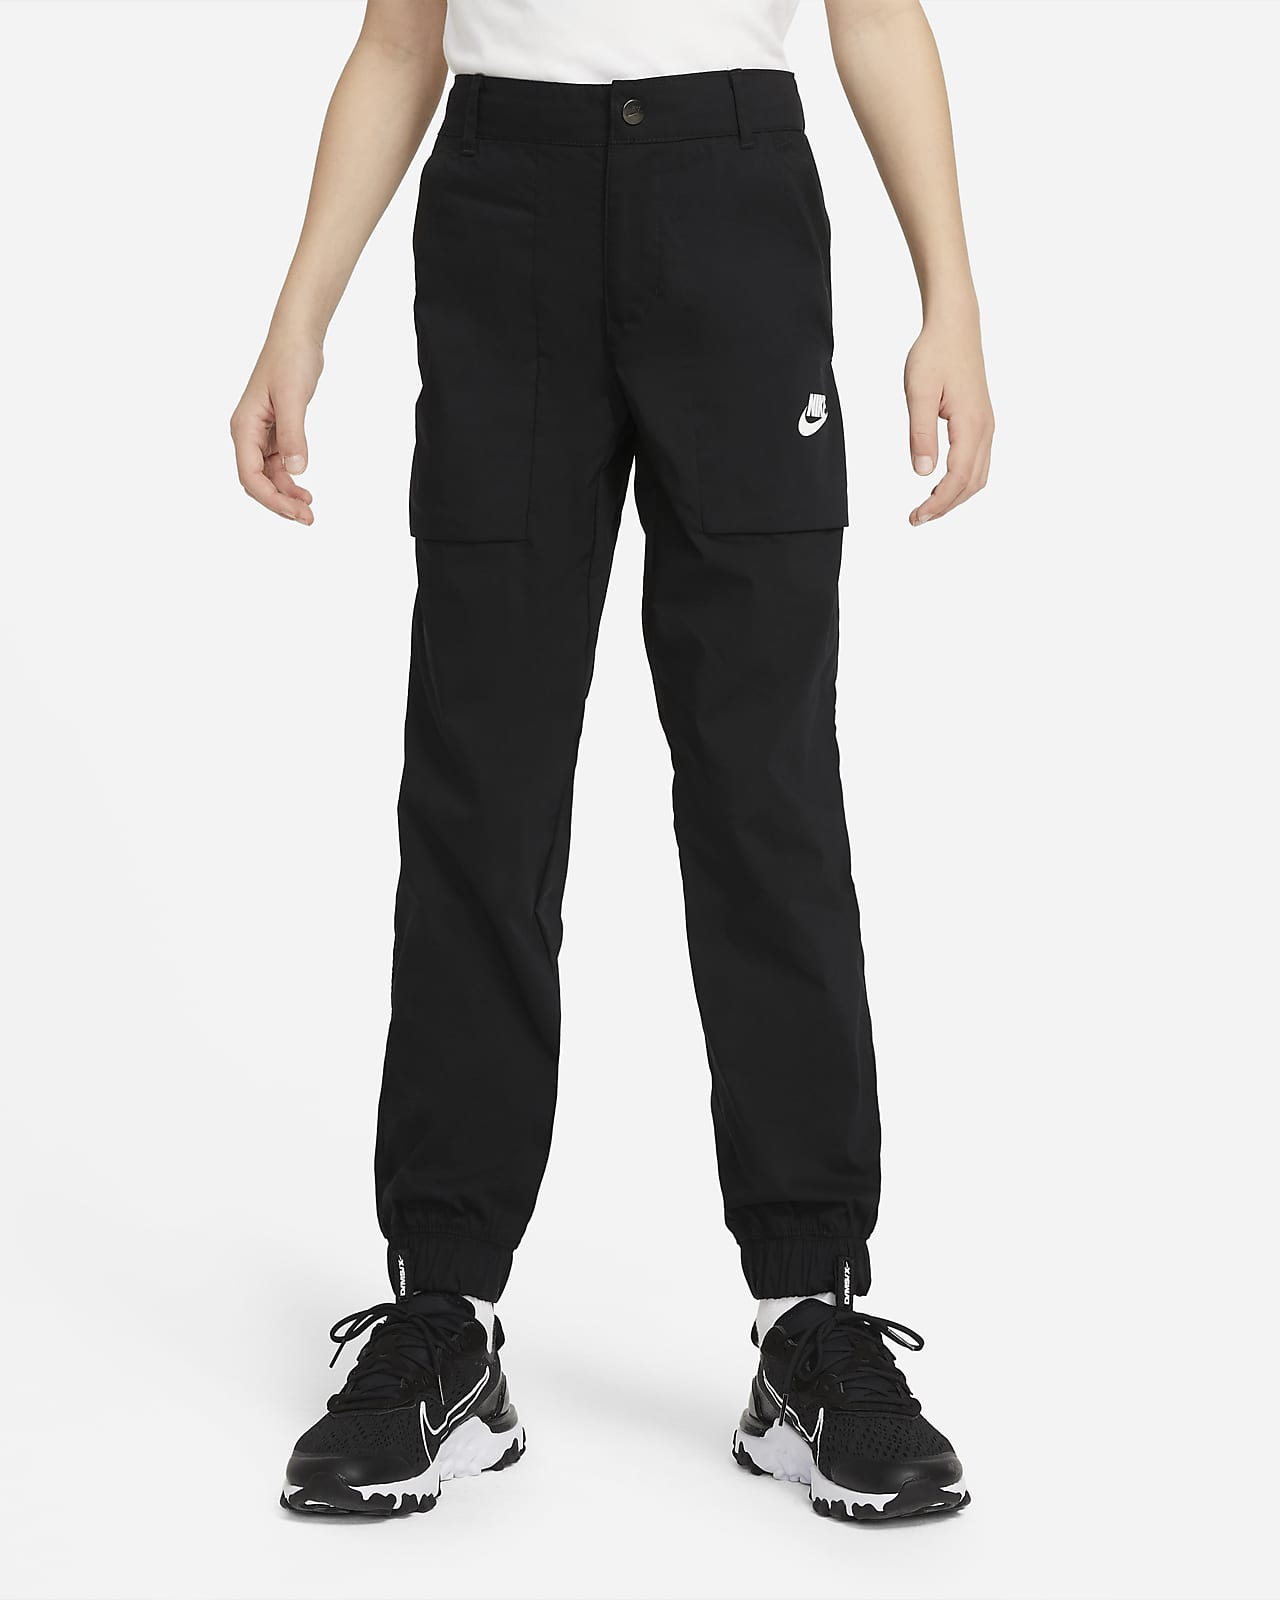 Pantalones cargo de tejido Woven para niños talla grande Nike Sportswear